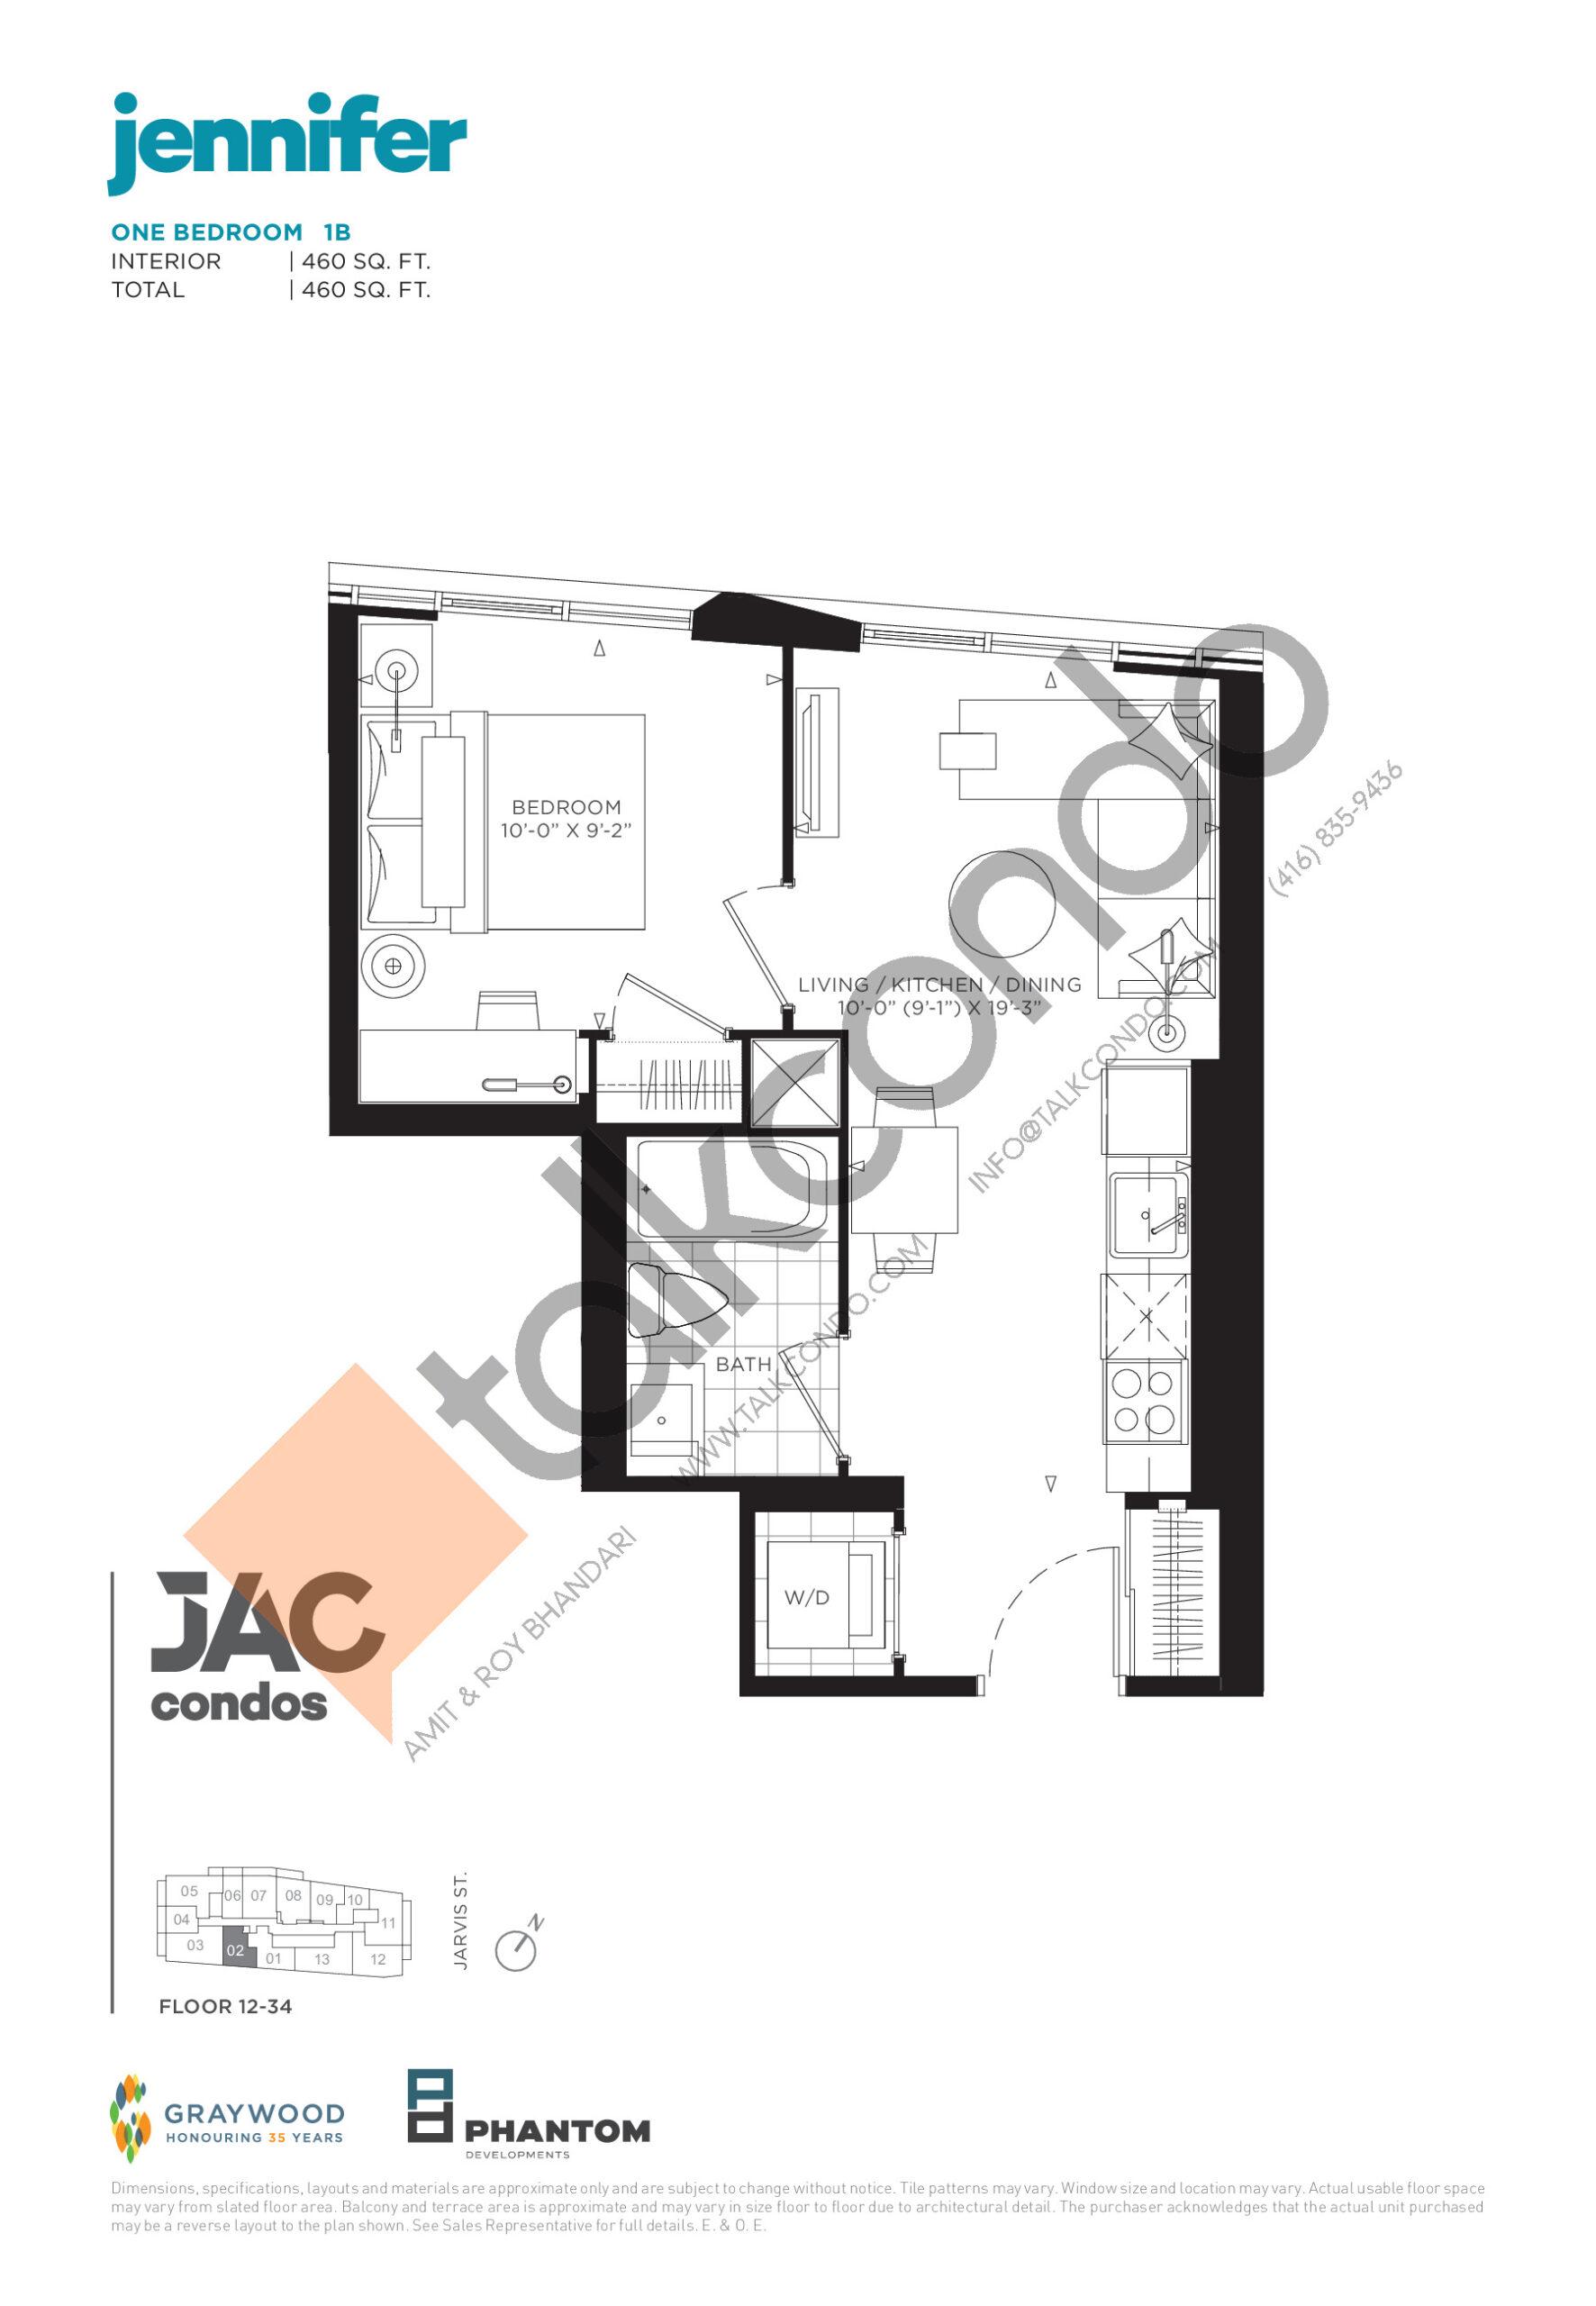 Jennifer Floor Plan at JAC Condos - 460 sq.ft